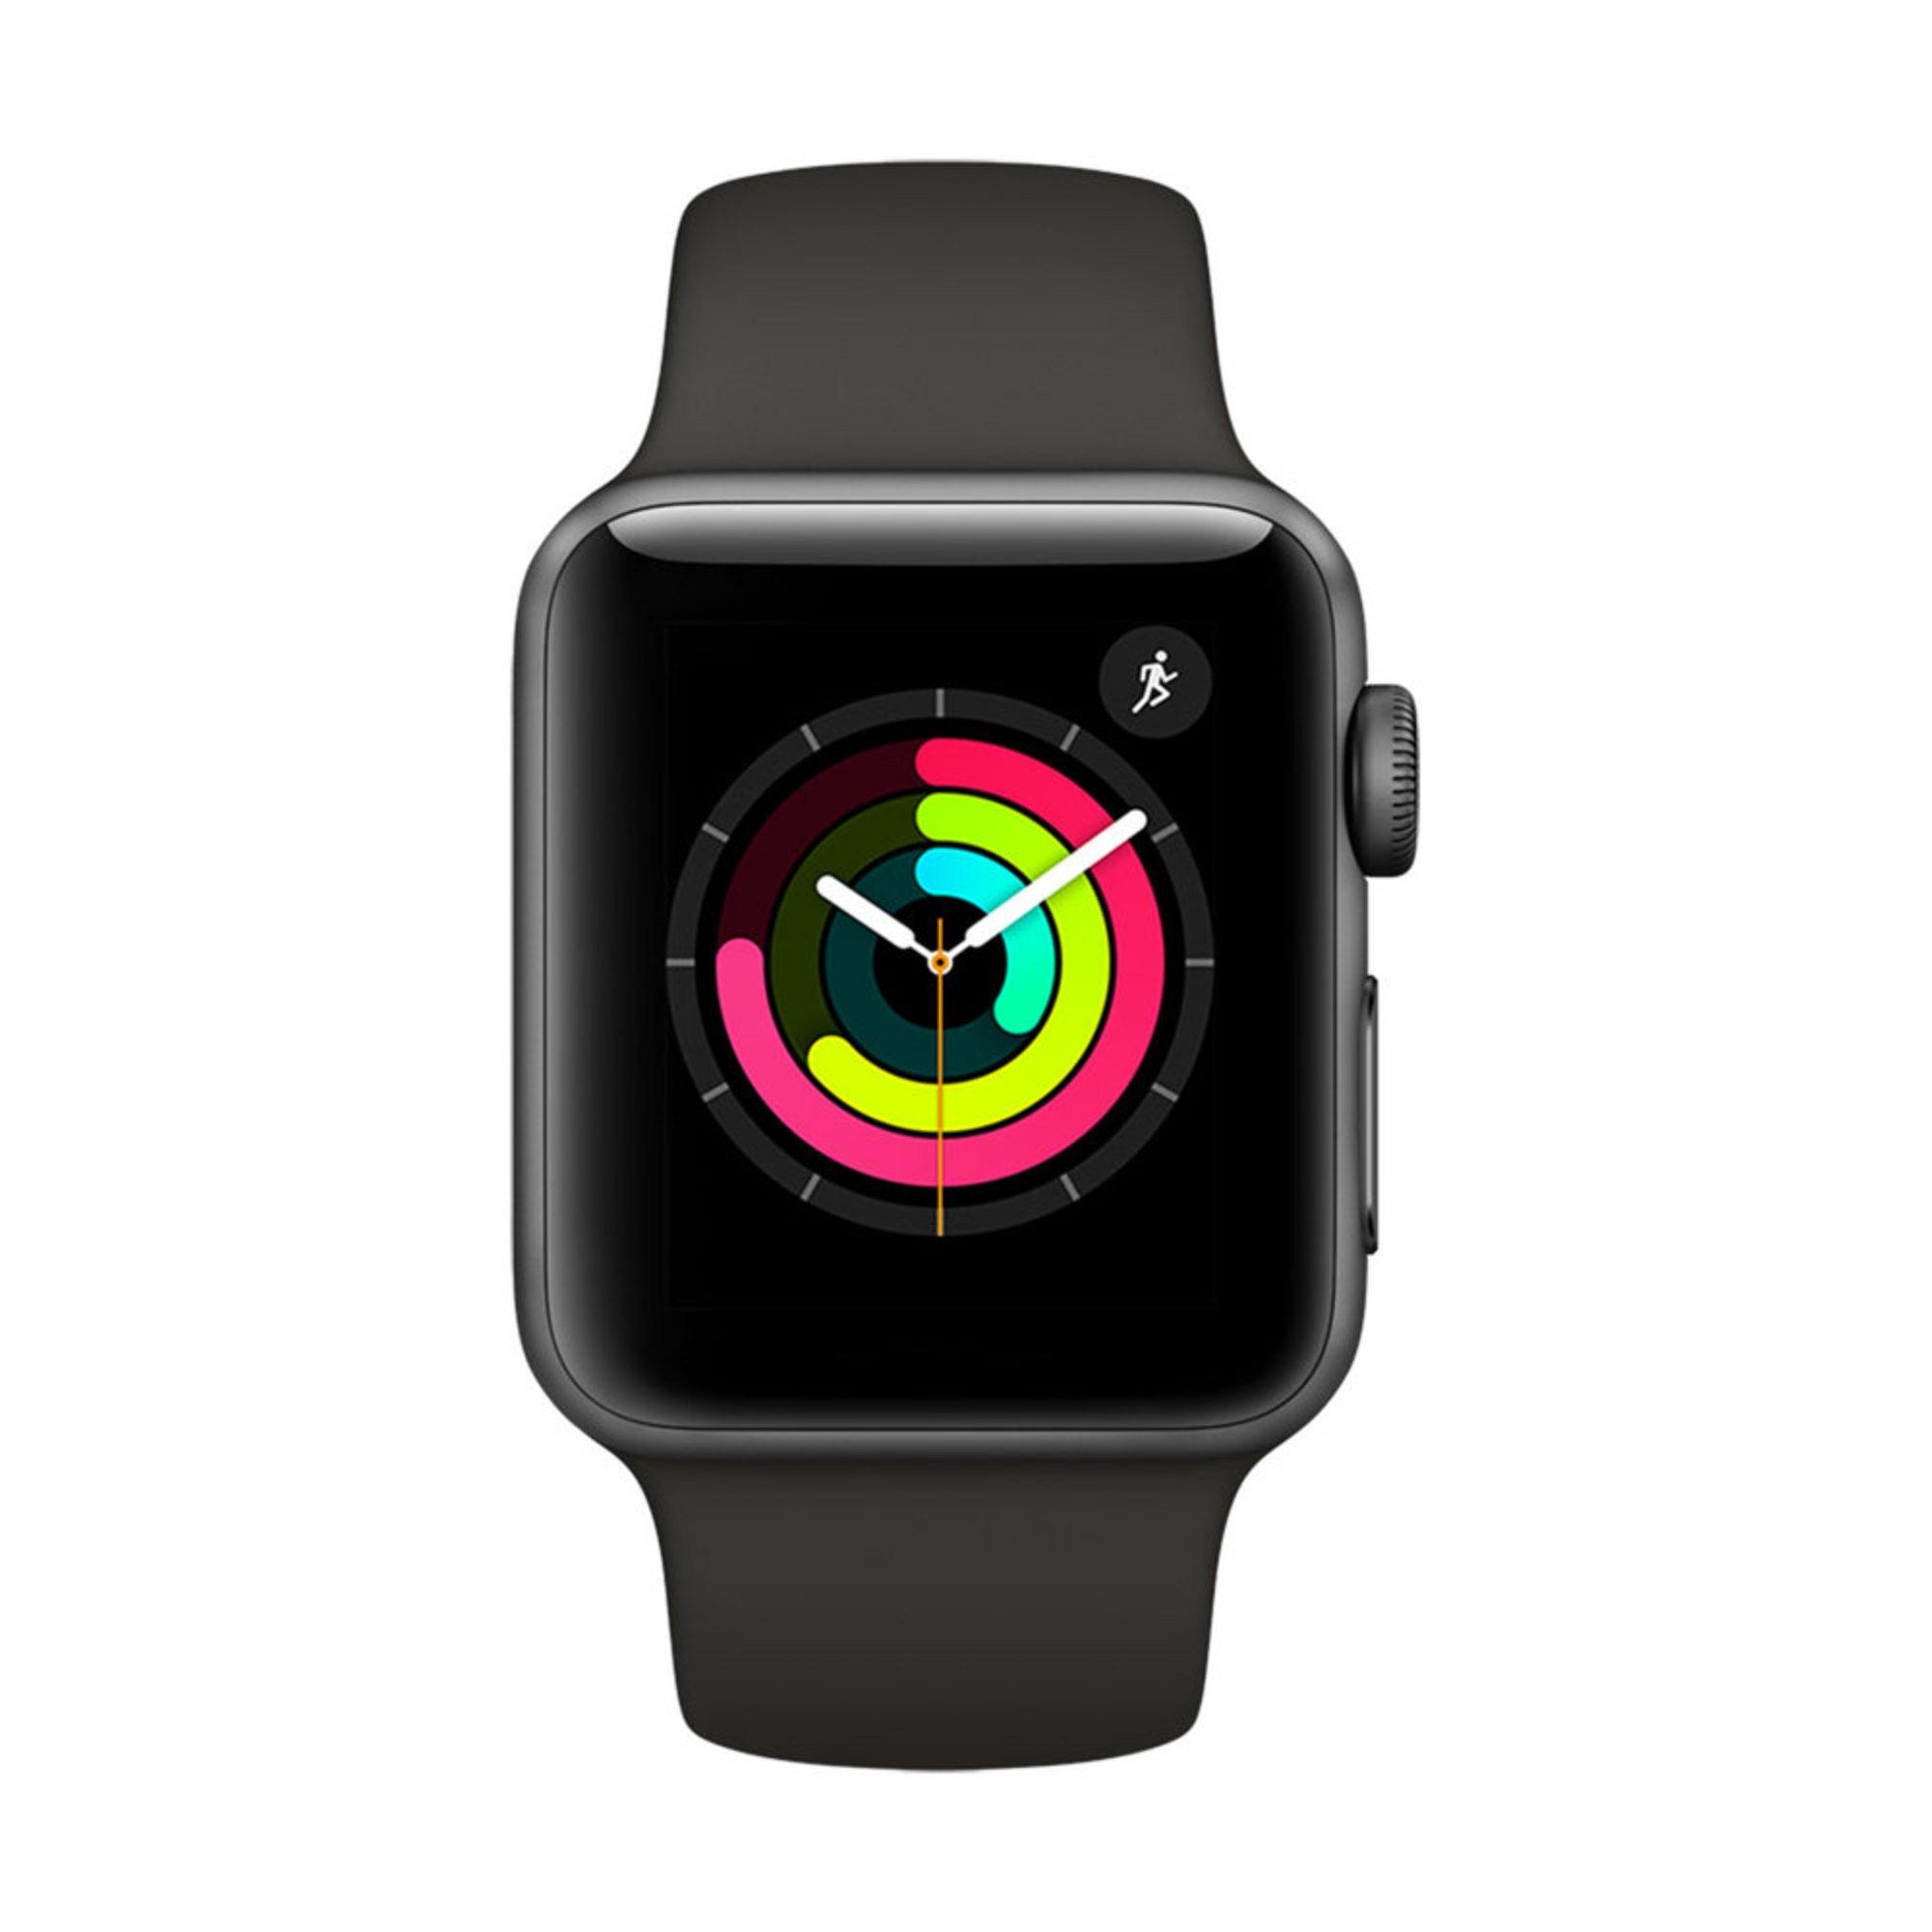 84e47e0e4ba Apple Watch Series 3 Gps Aluminum Case With Sport Band Applecare+ ...